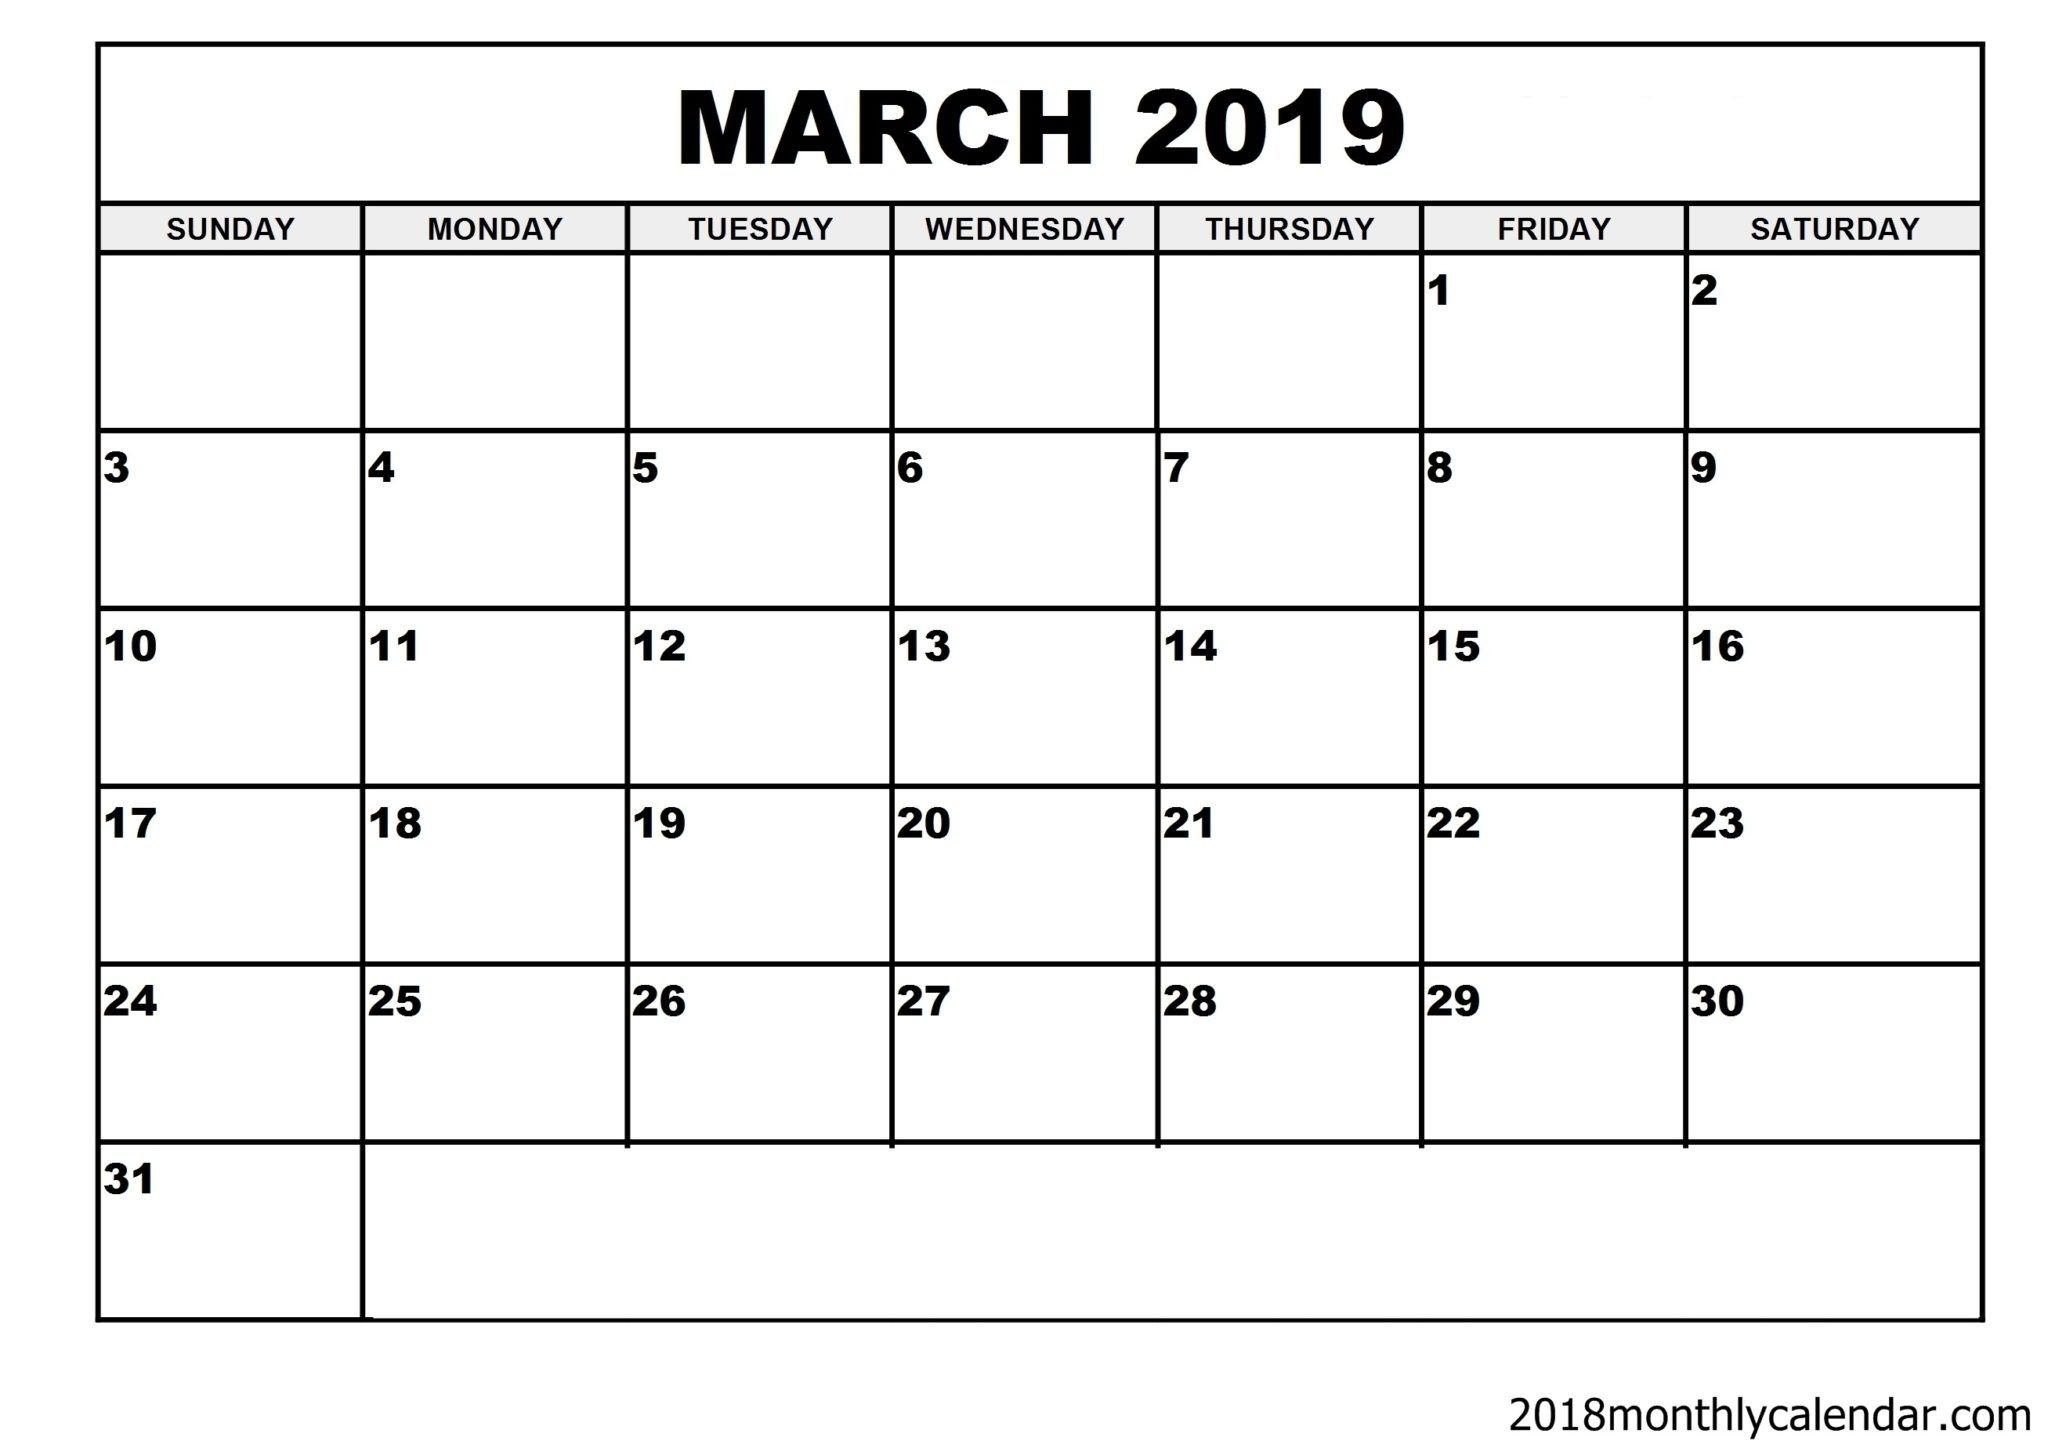 Download March 2019 Calendar – Blank Template - Editable Calendar pertaining to Free Fillable Blank Calendar Templates